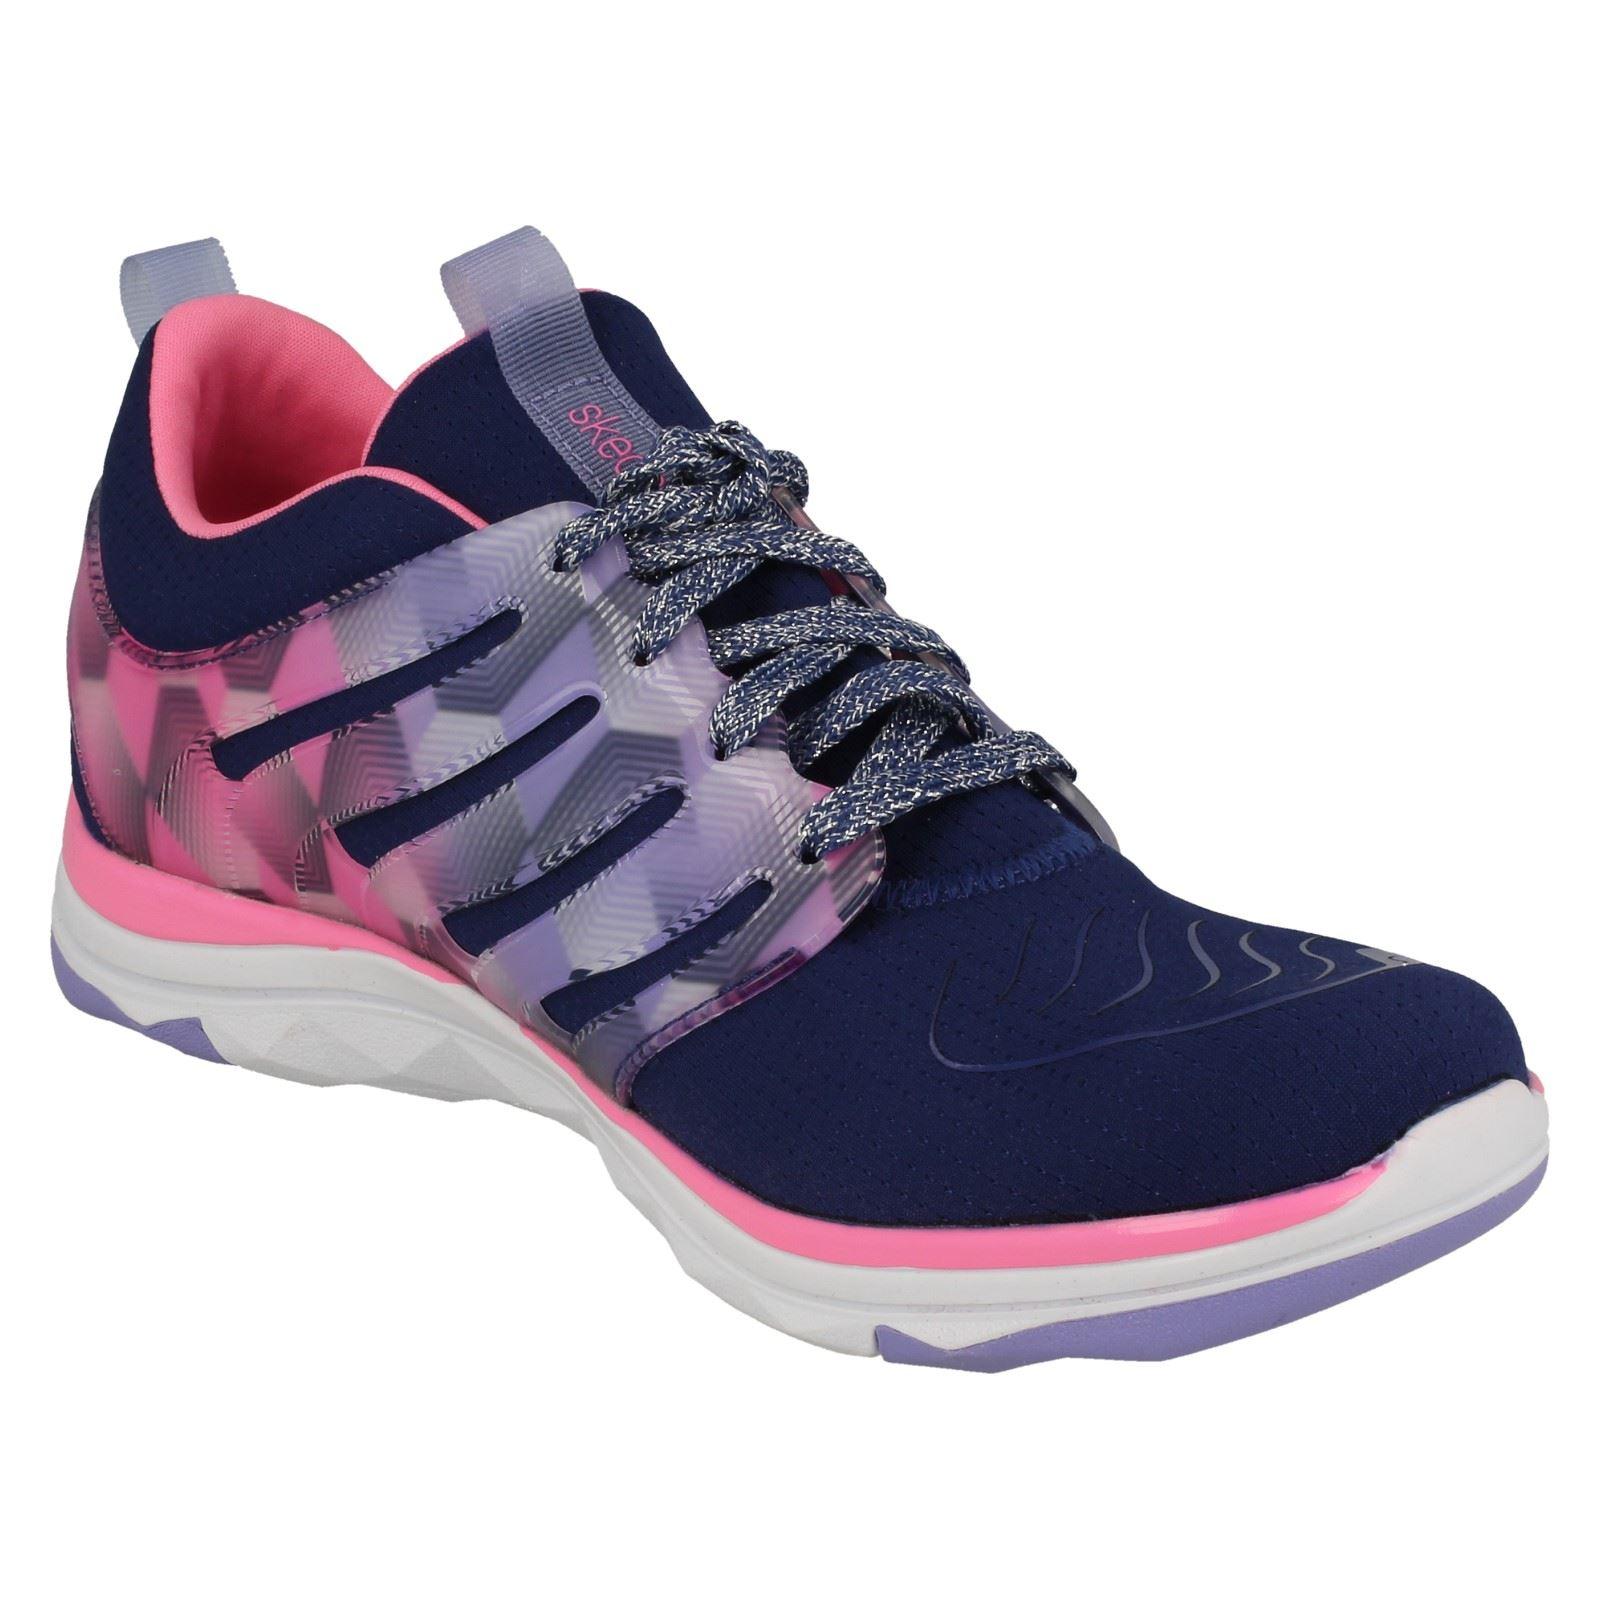 scarpe 81560 Girls Runner ginnastica blu hot Navy Pink Skechers Casual Up da Lace Diamond xInTzfw